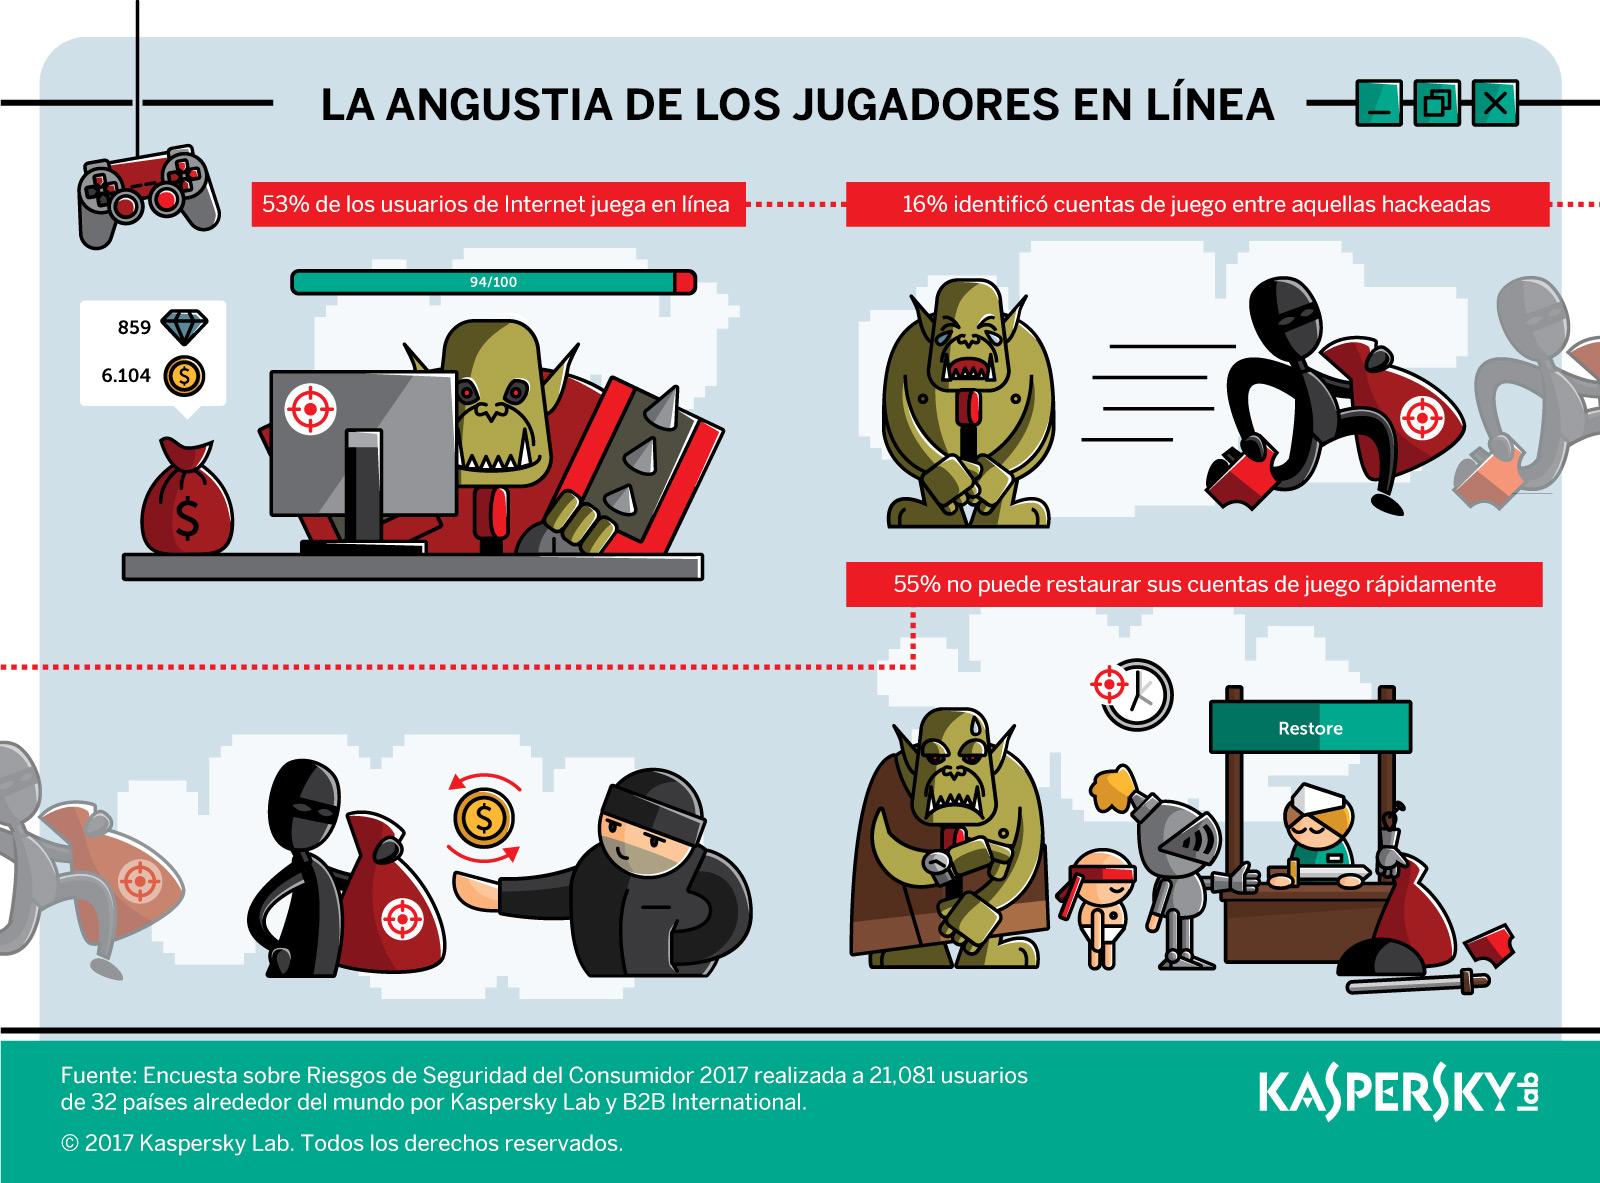 Jugadores en línea de América Latina dejan sus cuentas vulnerables a ciberamenazas